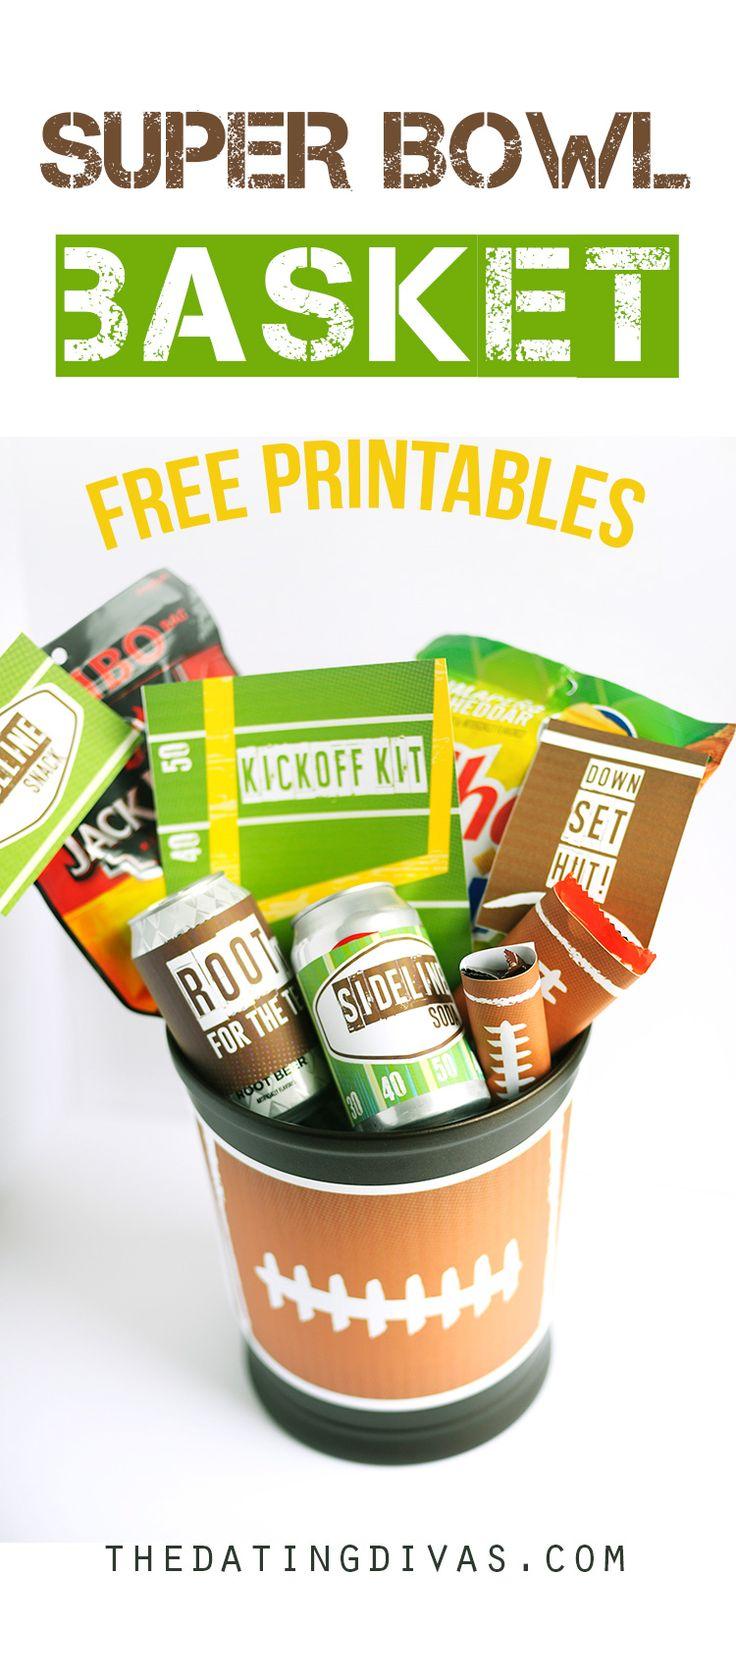 Free printables to make your man his own Super Bowl Basket Kickoff Kit - a footb...